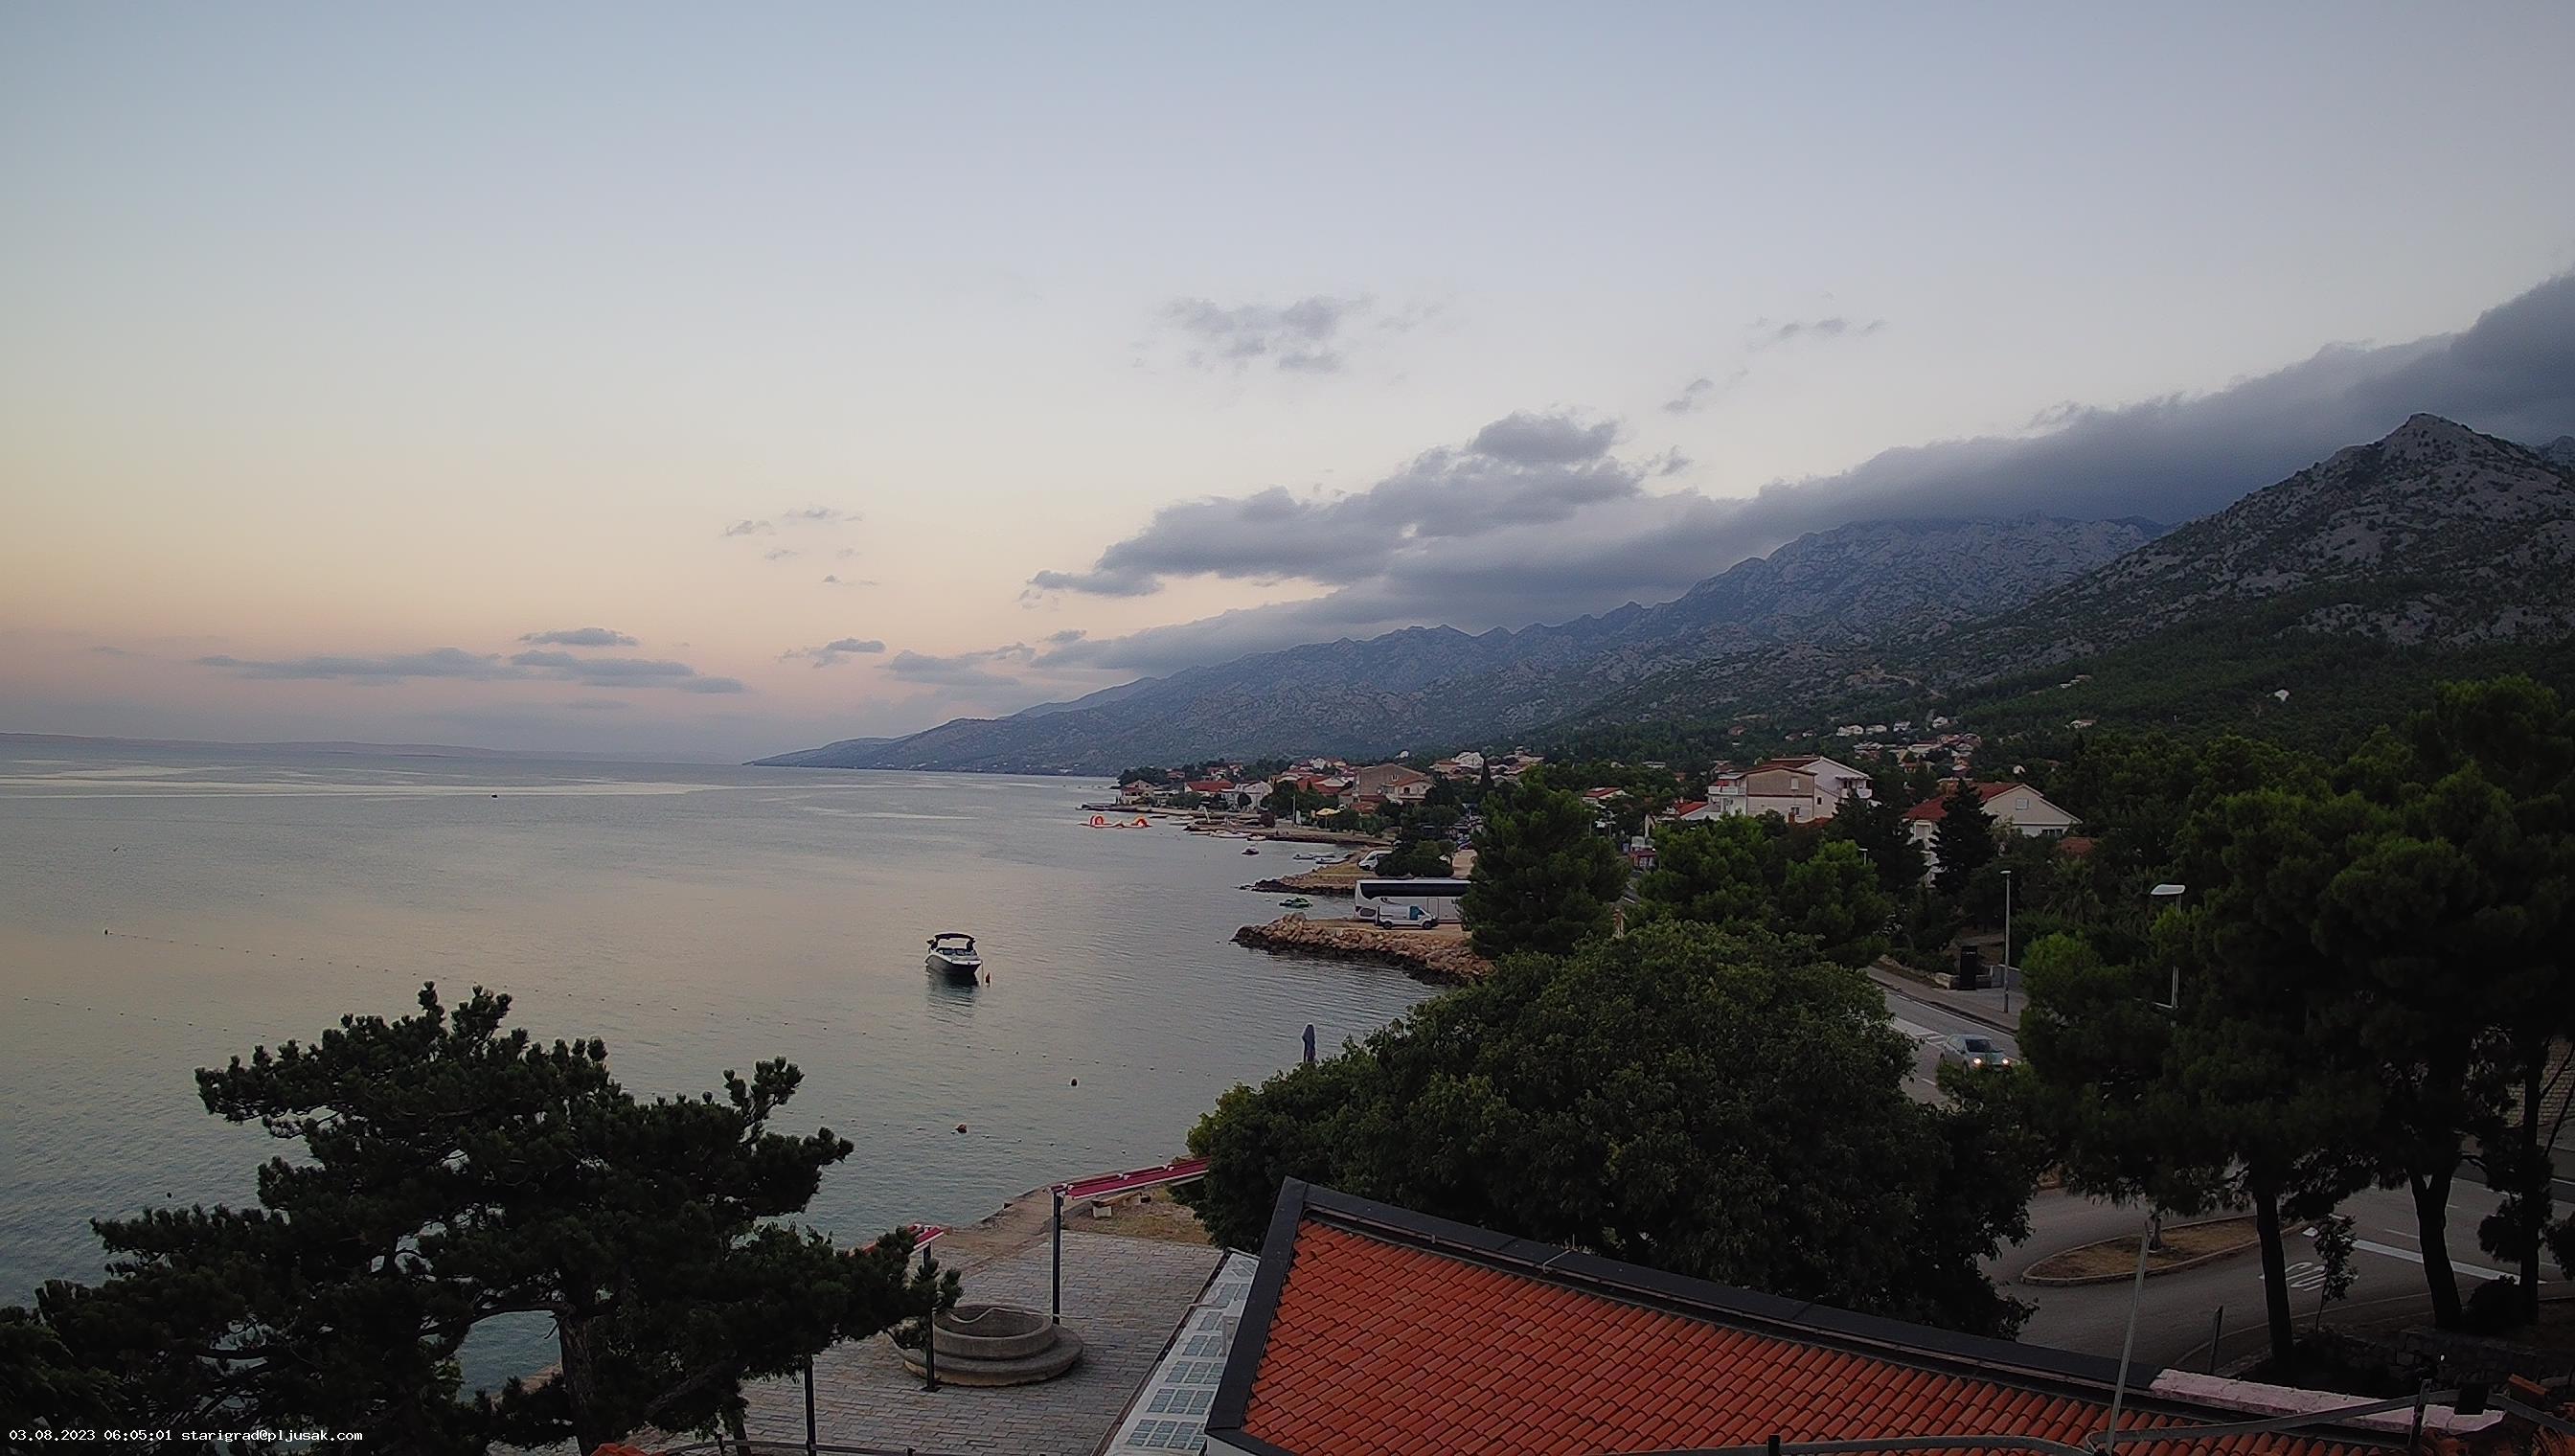 Webcam - Starigrad Paklenica